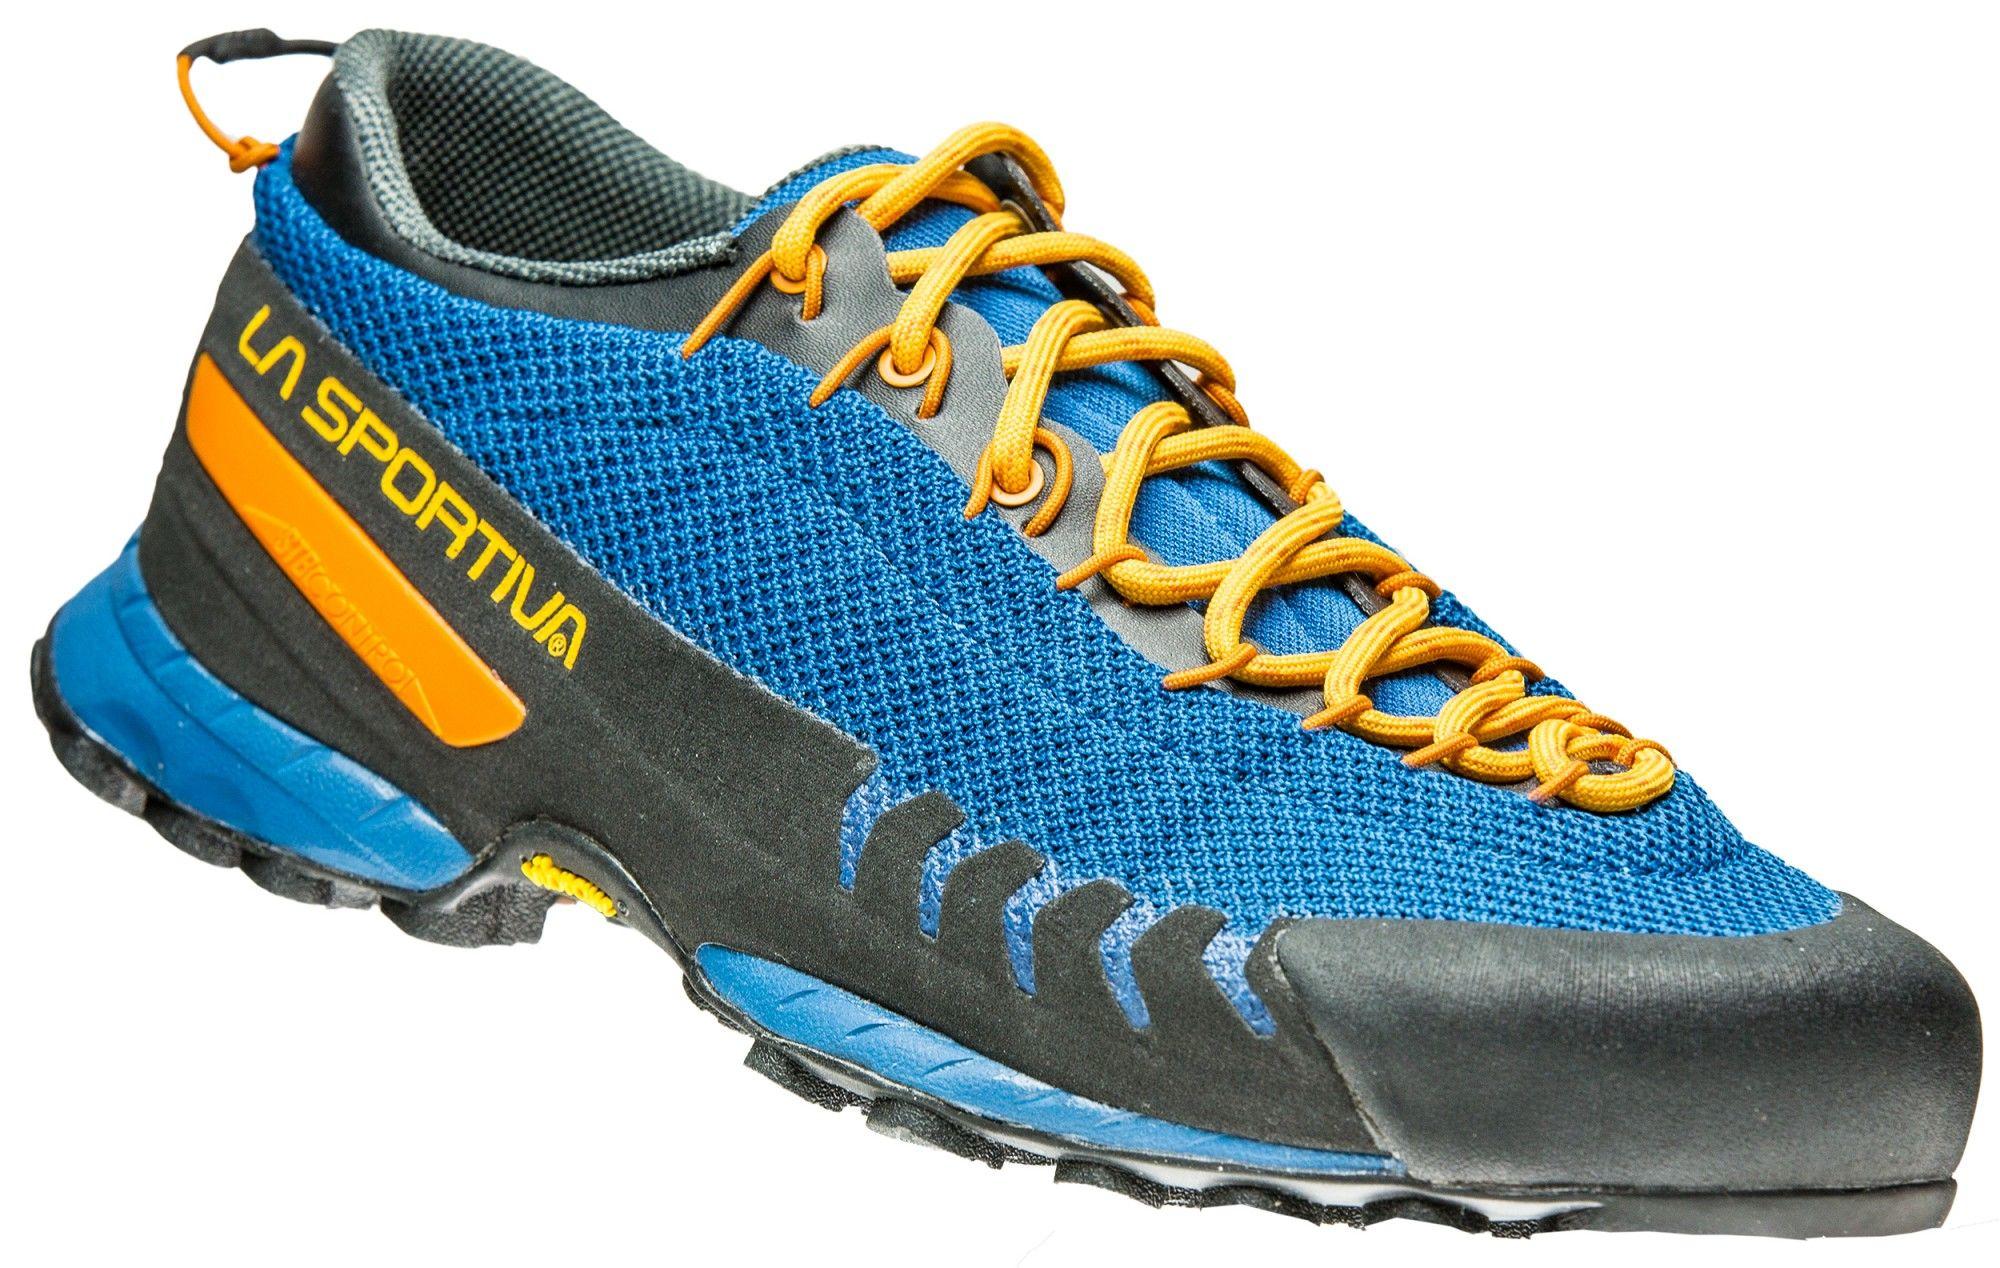 La Sportiva TX 3 Blau, Male EU 40.5 -Farbe Blue -Papaya, 40.5